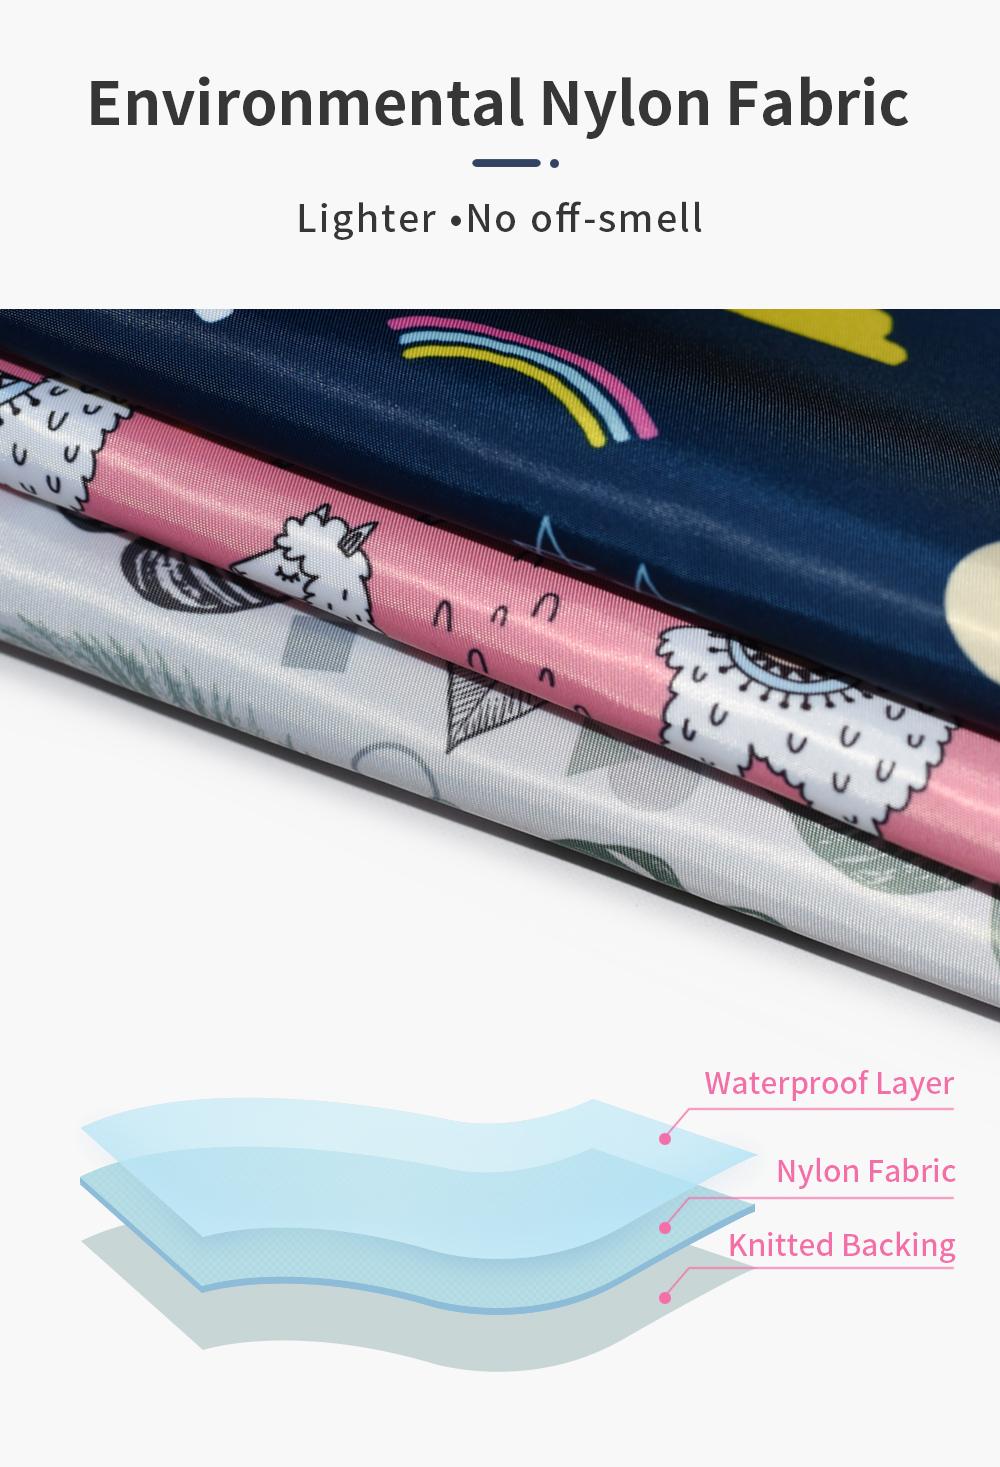 Waterproof Multifunctional Diaper Bag 10